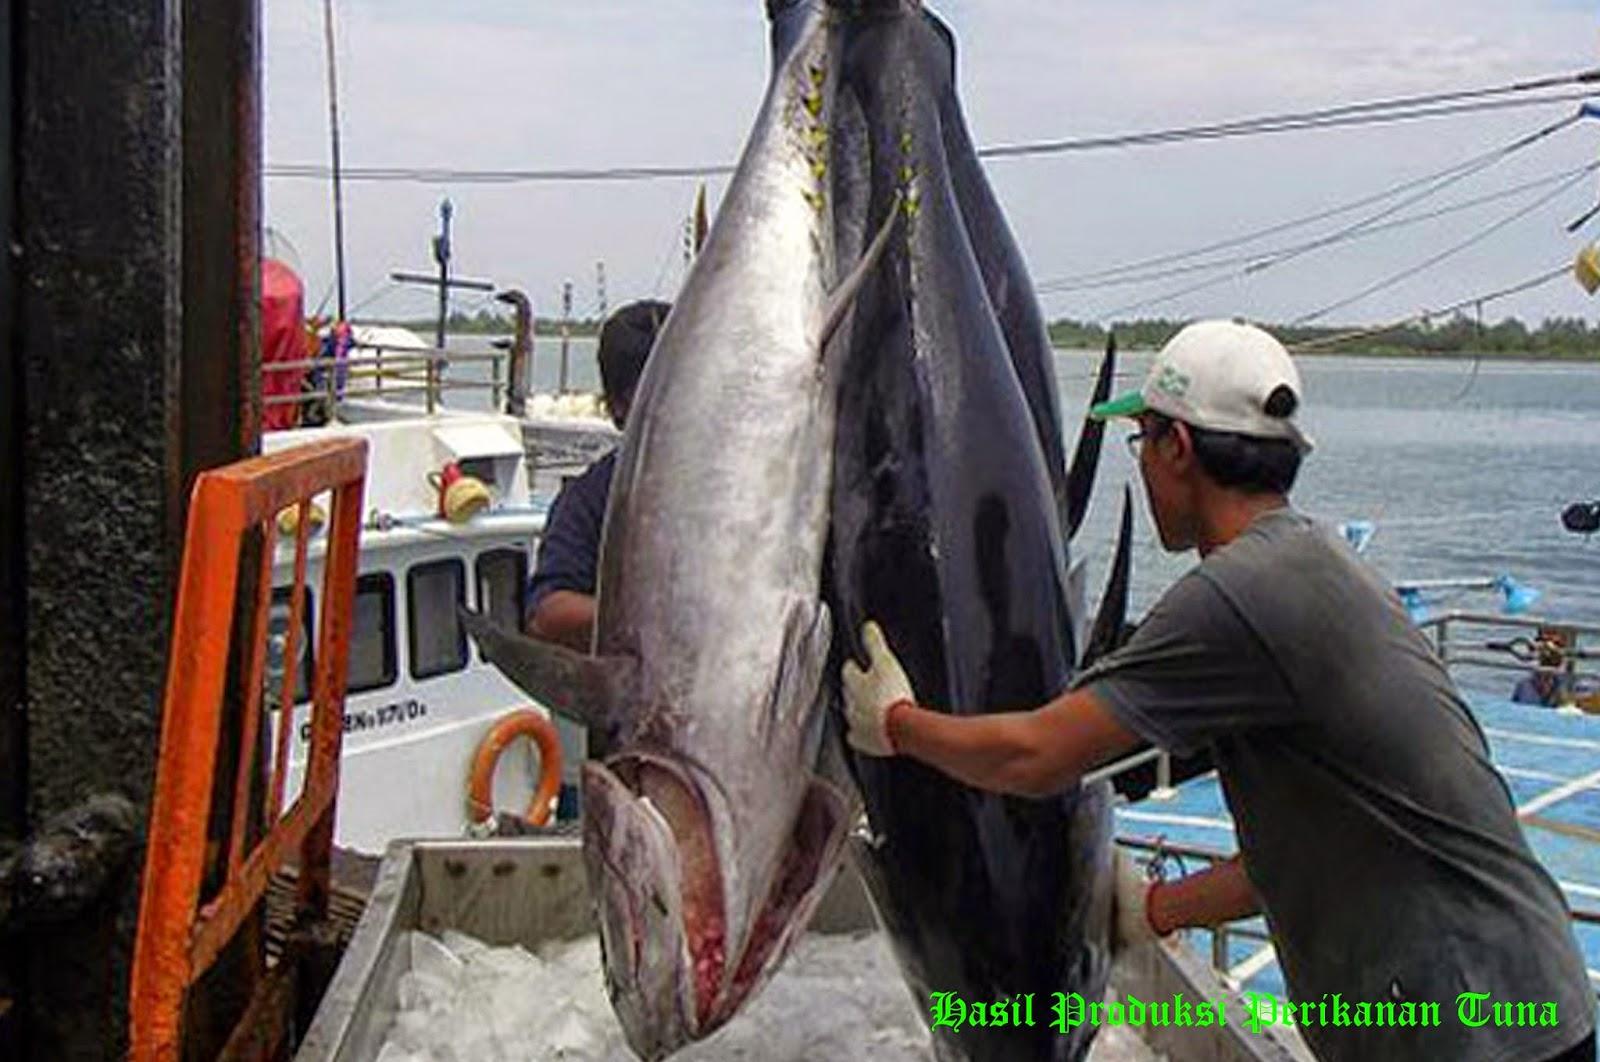 Menangkap ikan yaitu salah satu mata pencaharian bagi nelayan Kabar Terbaru- MENANGKAP IKAN DENGAN LONGLINE